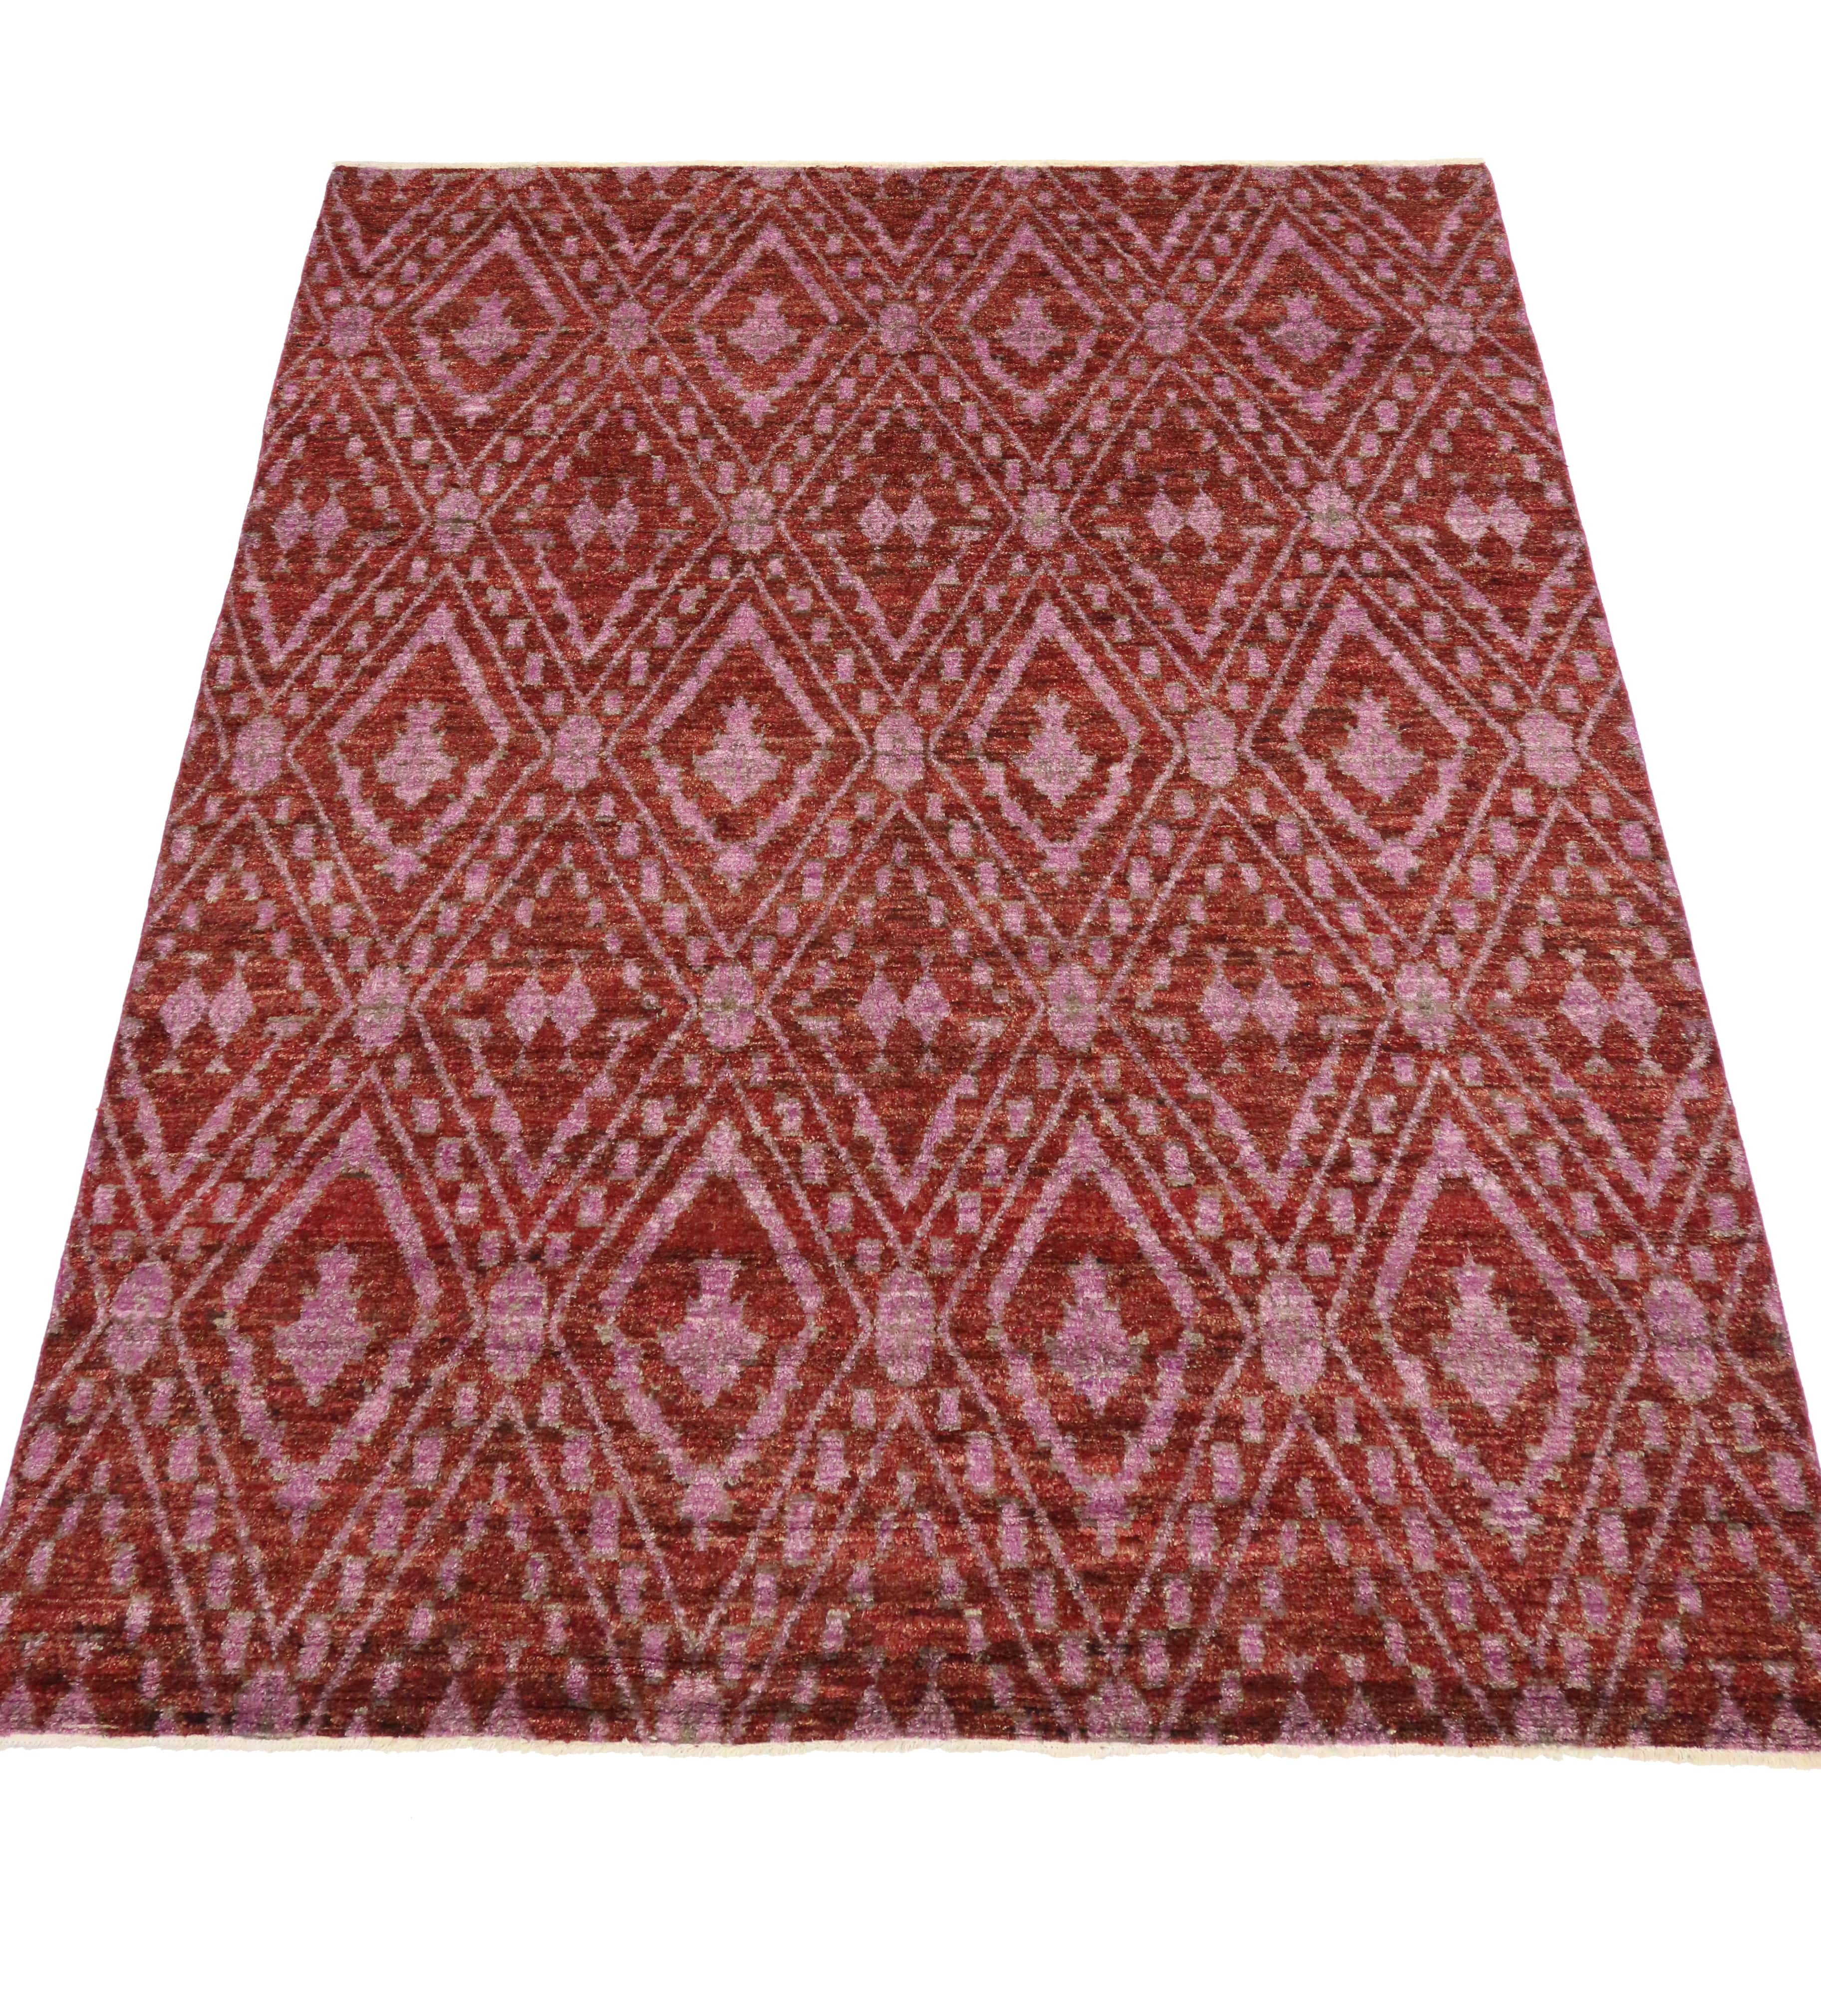 New Moroccan Oriental Rug 9 X 13